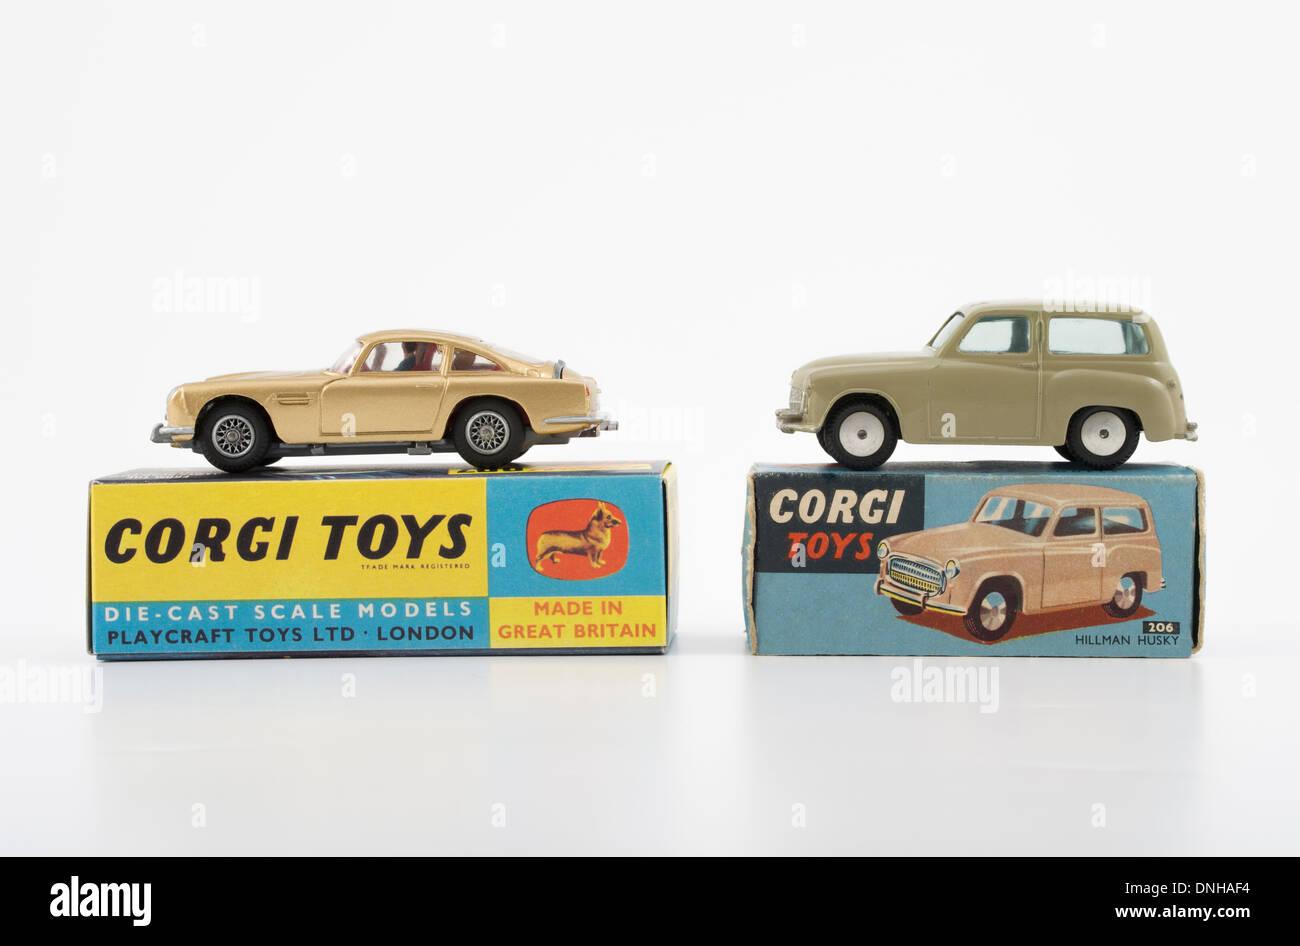 Corgi Toys Die-cast car #261 Goldfinger Aston Martin DB5 #206 Hillman Husky - Stock Image